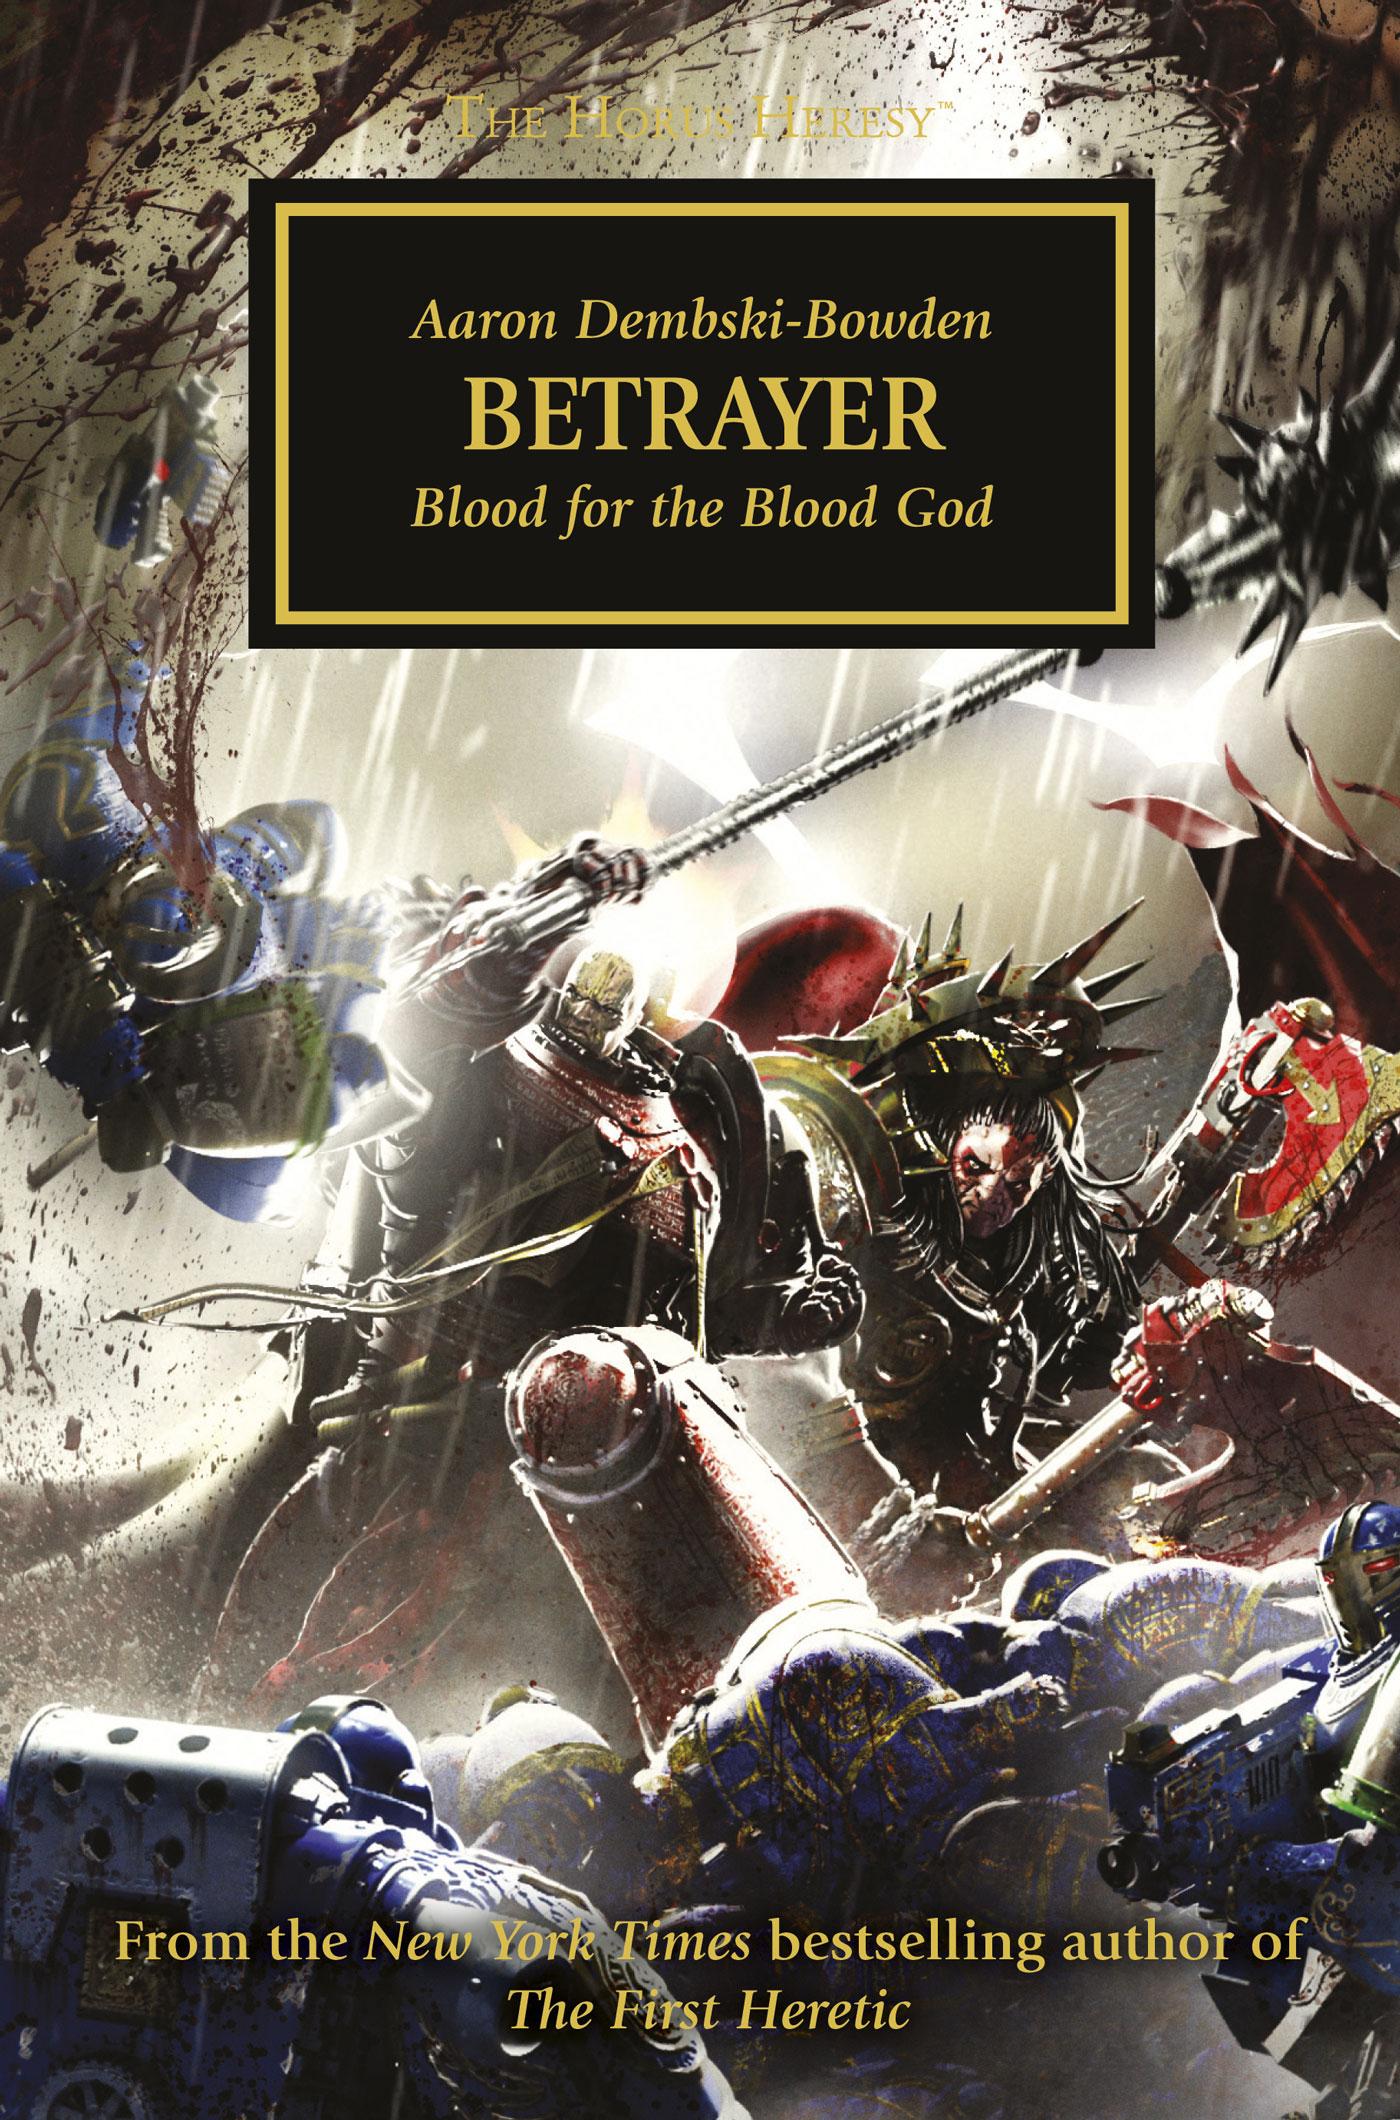 Betrayer by Aaron Dembski-Bowden